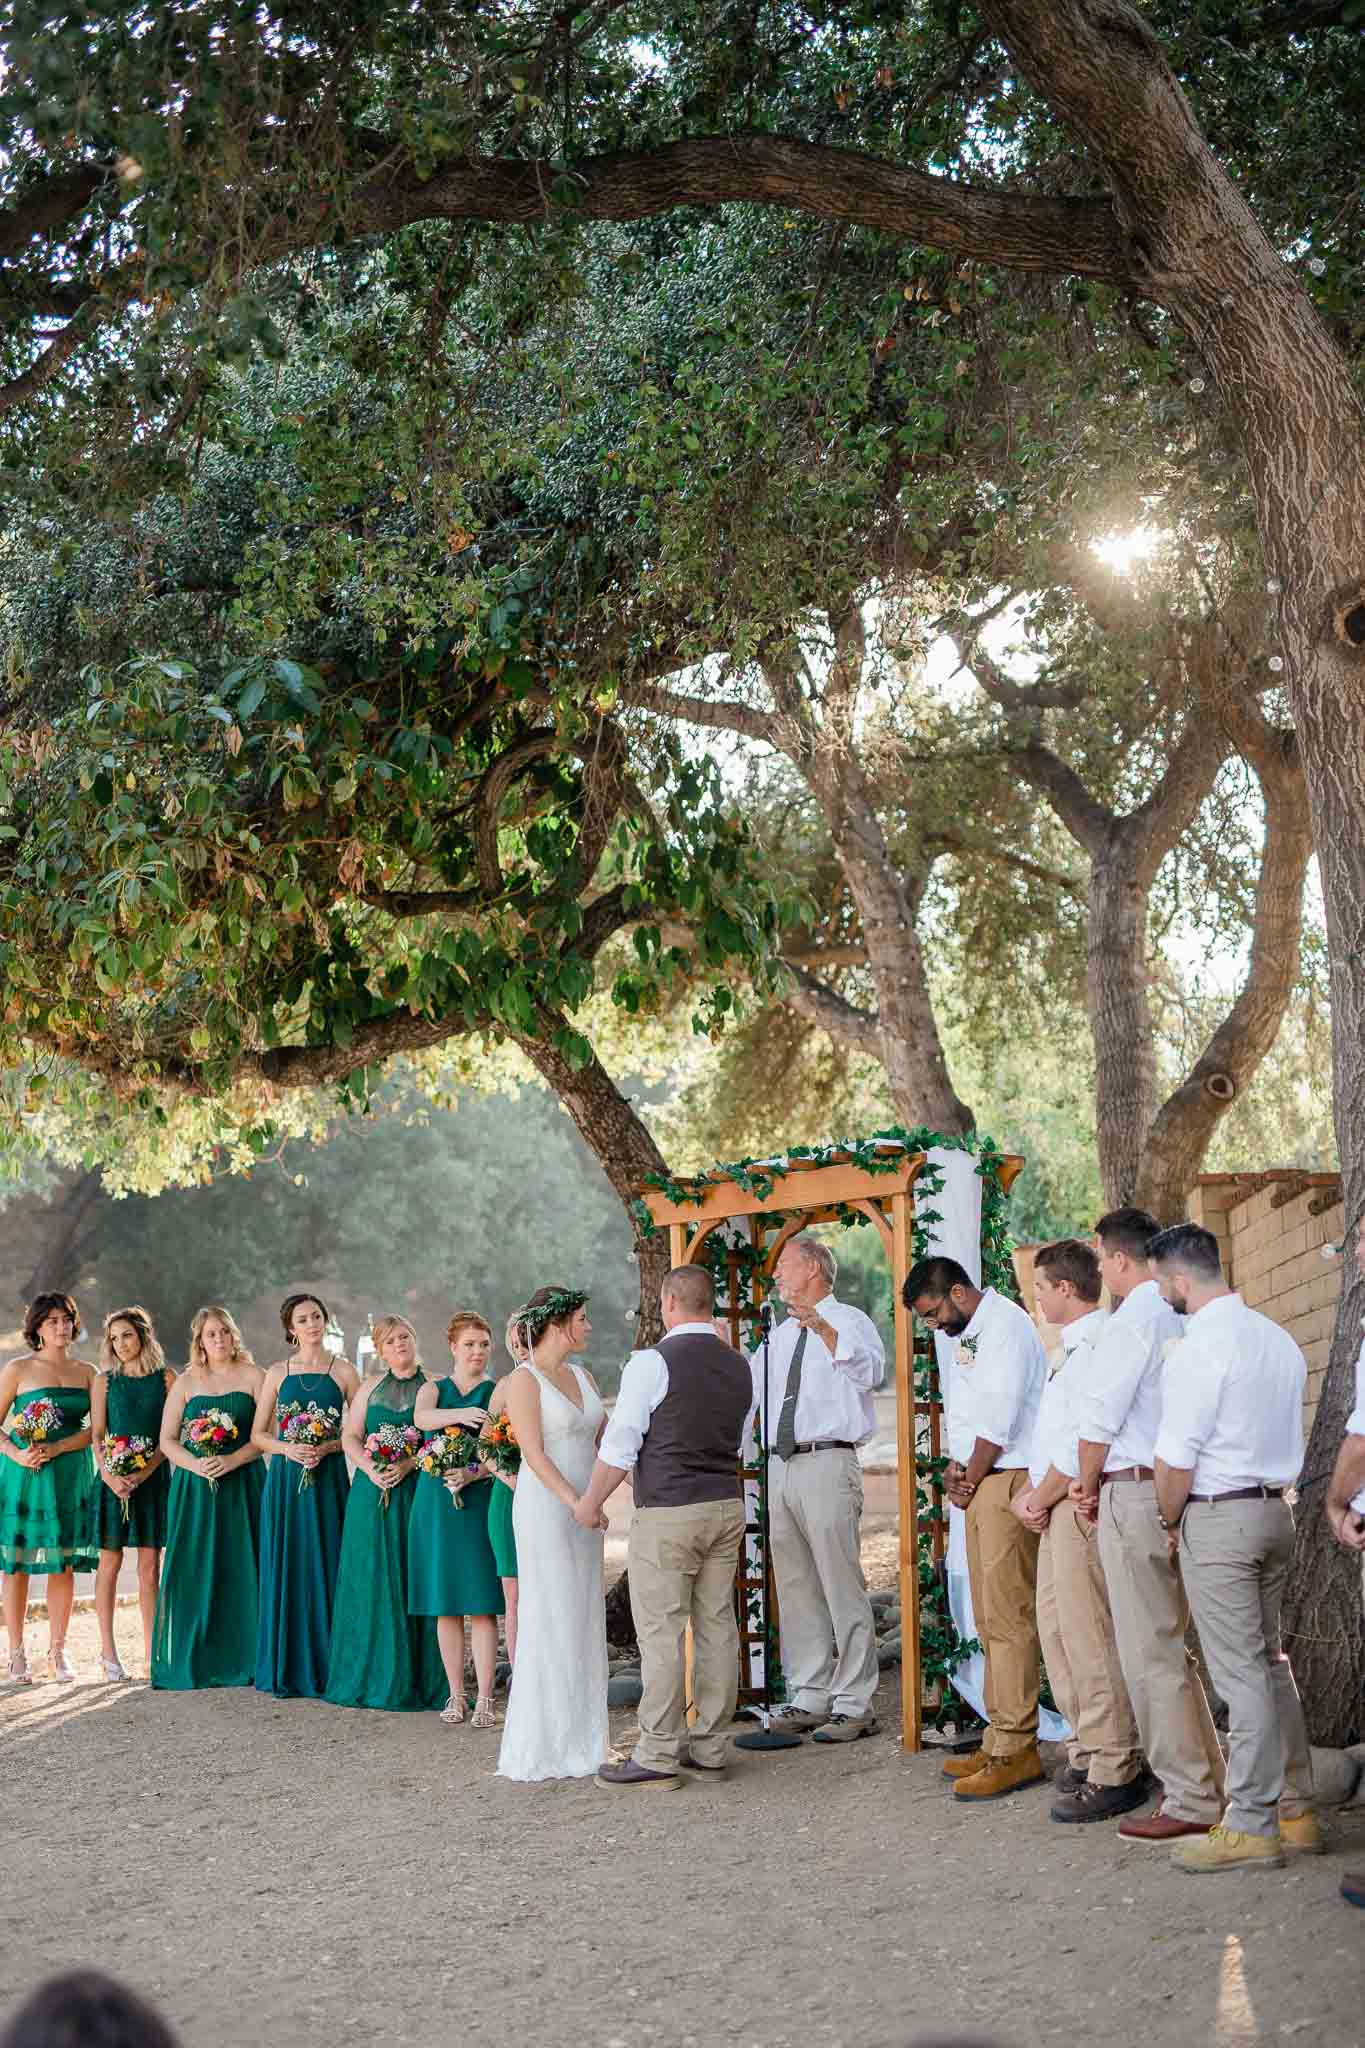 Backyard wedding ceremony in Pasadena, California